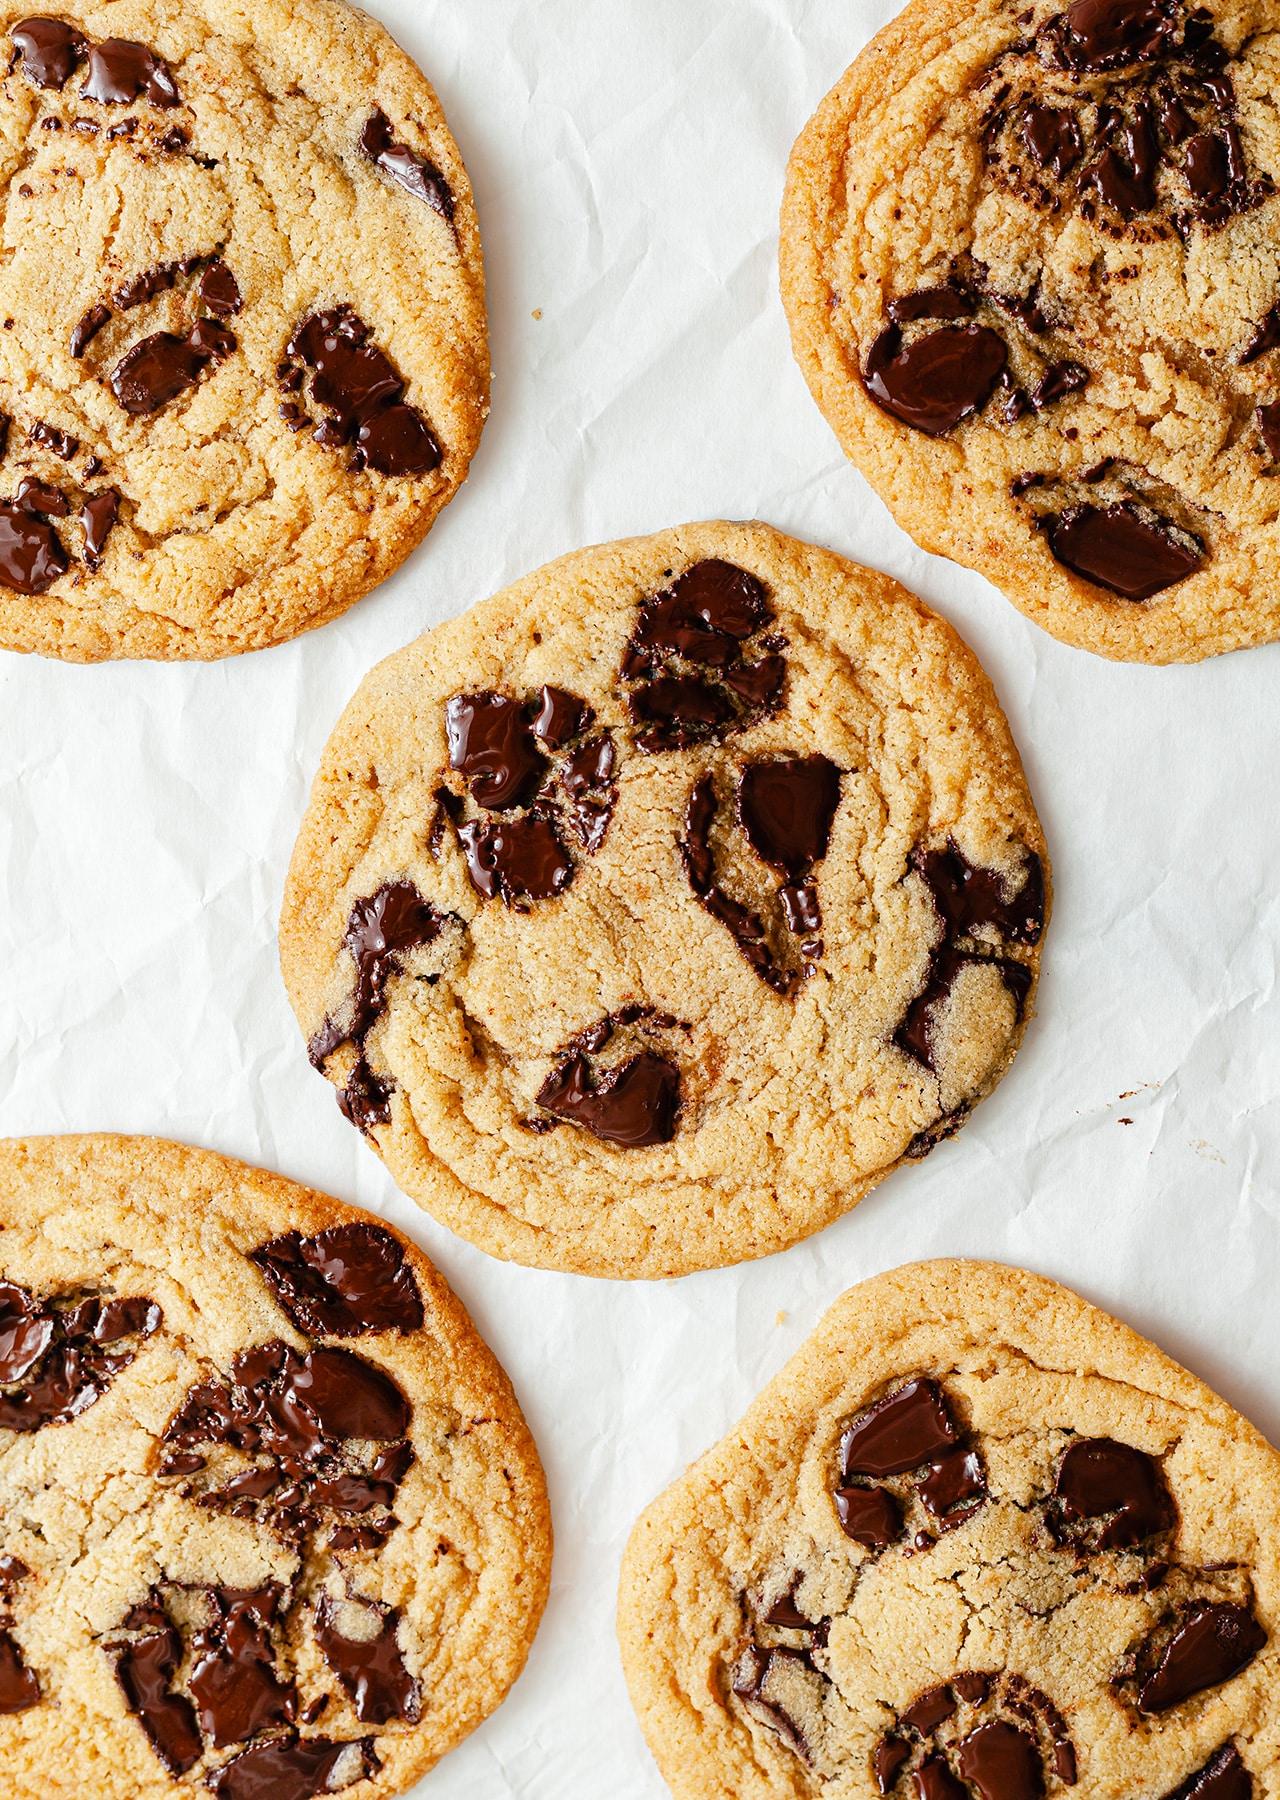 4-Ingredient Vegan Cookies Chocolate Chip Recipe